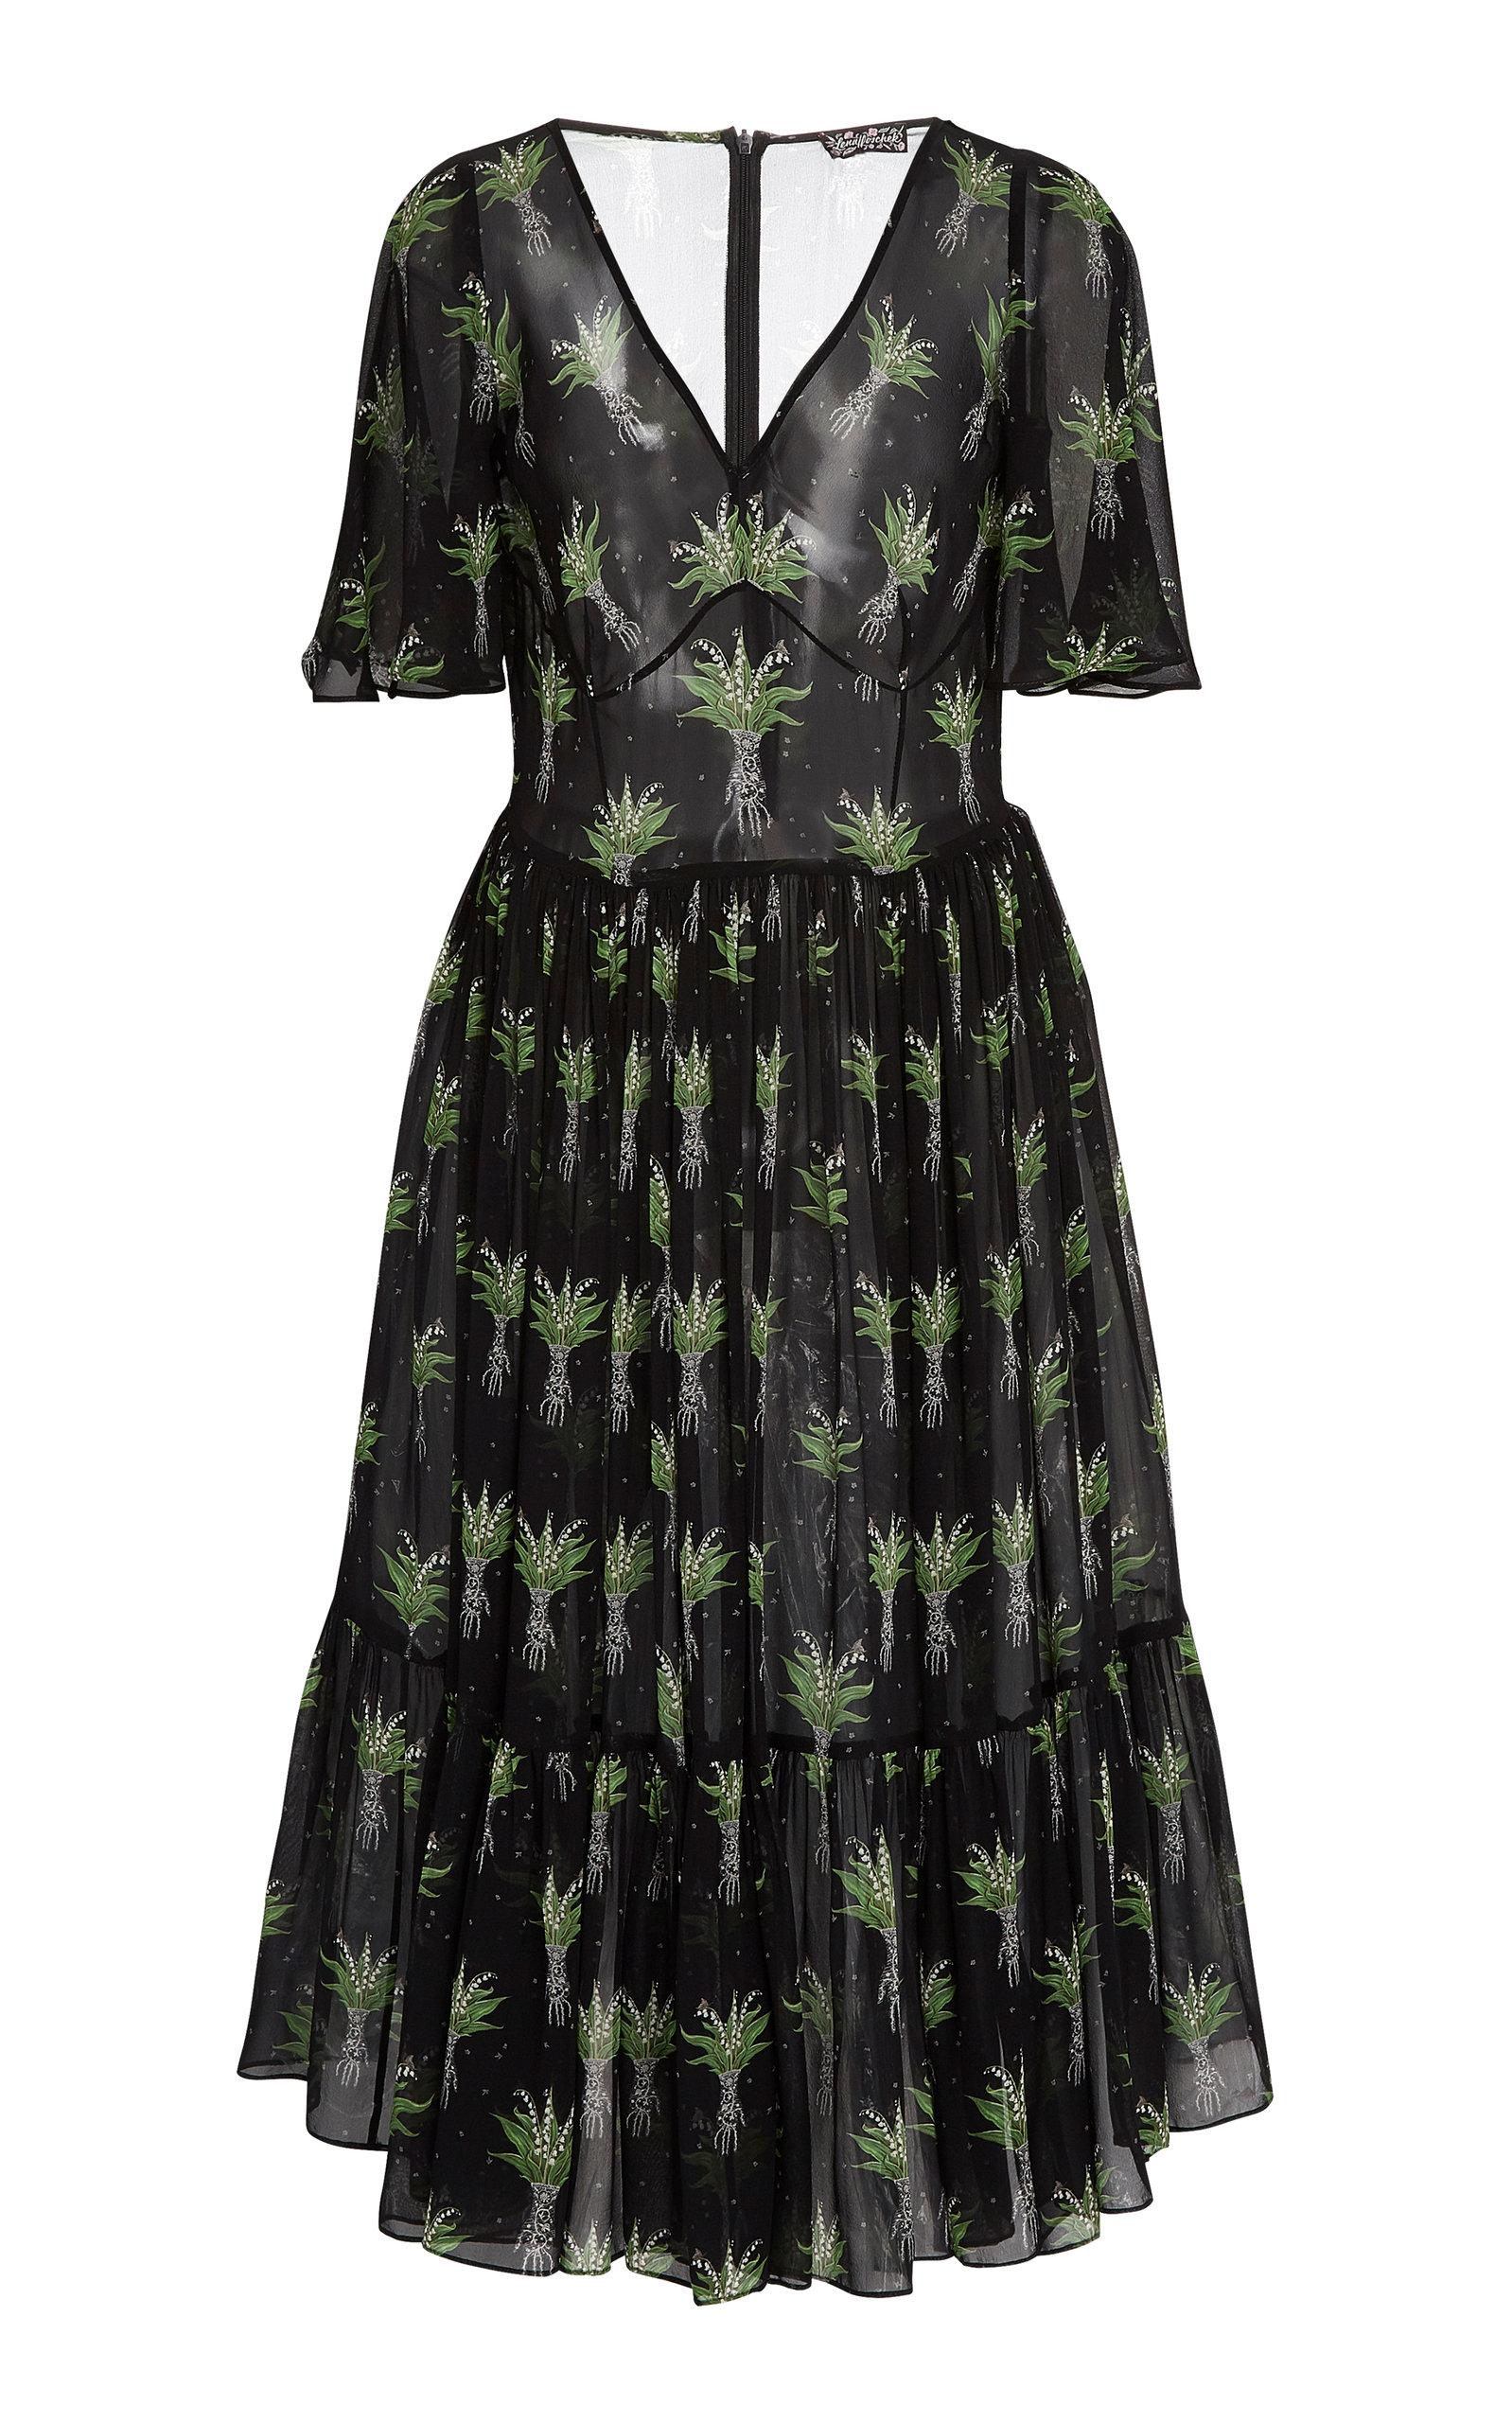 Buy Lena Hoschek Melancholia Printed Midi Dress online, shop Lena Hoschek at the best price